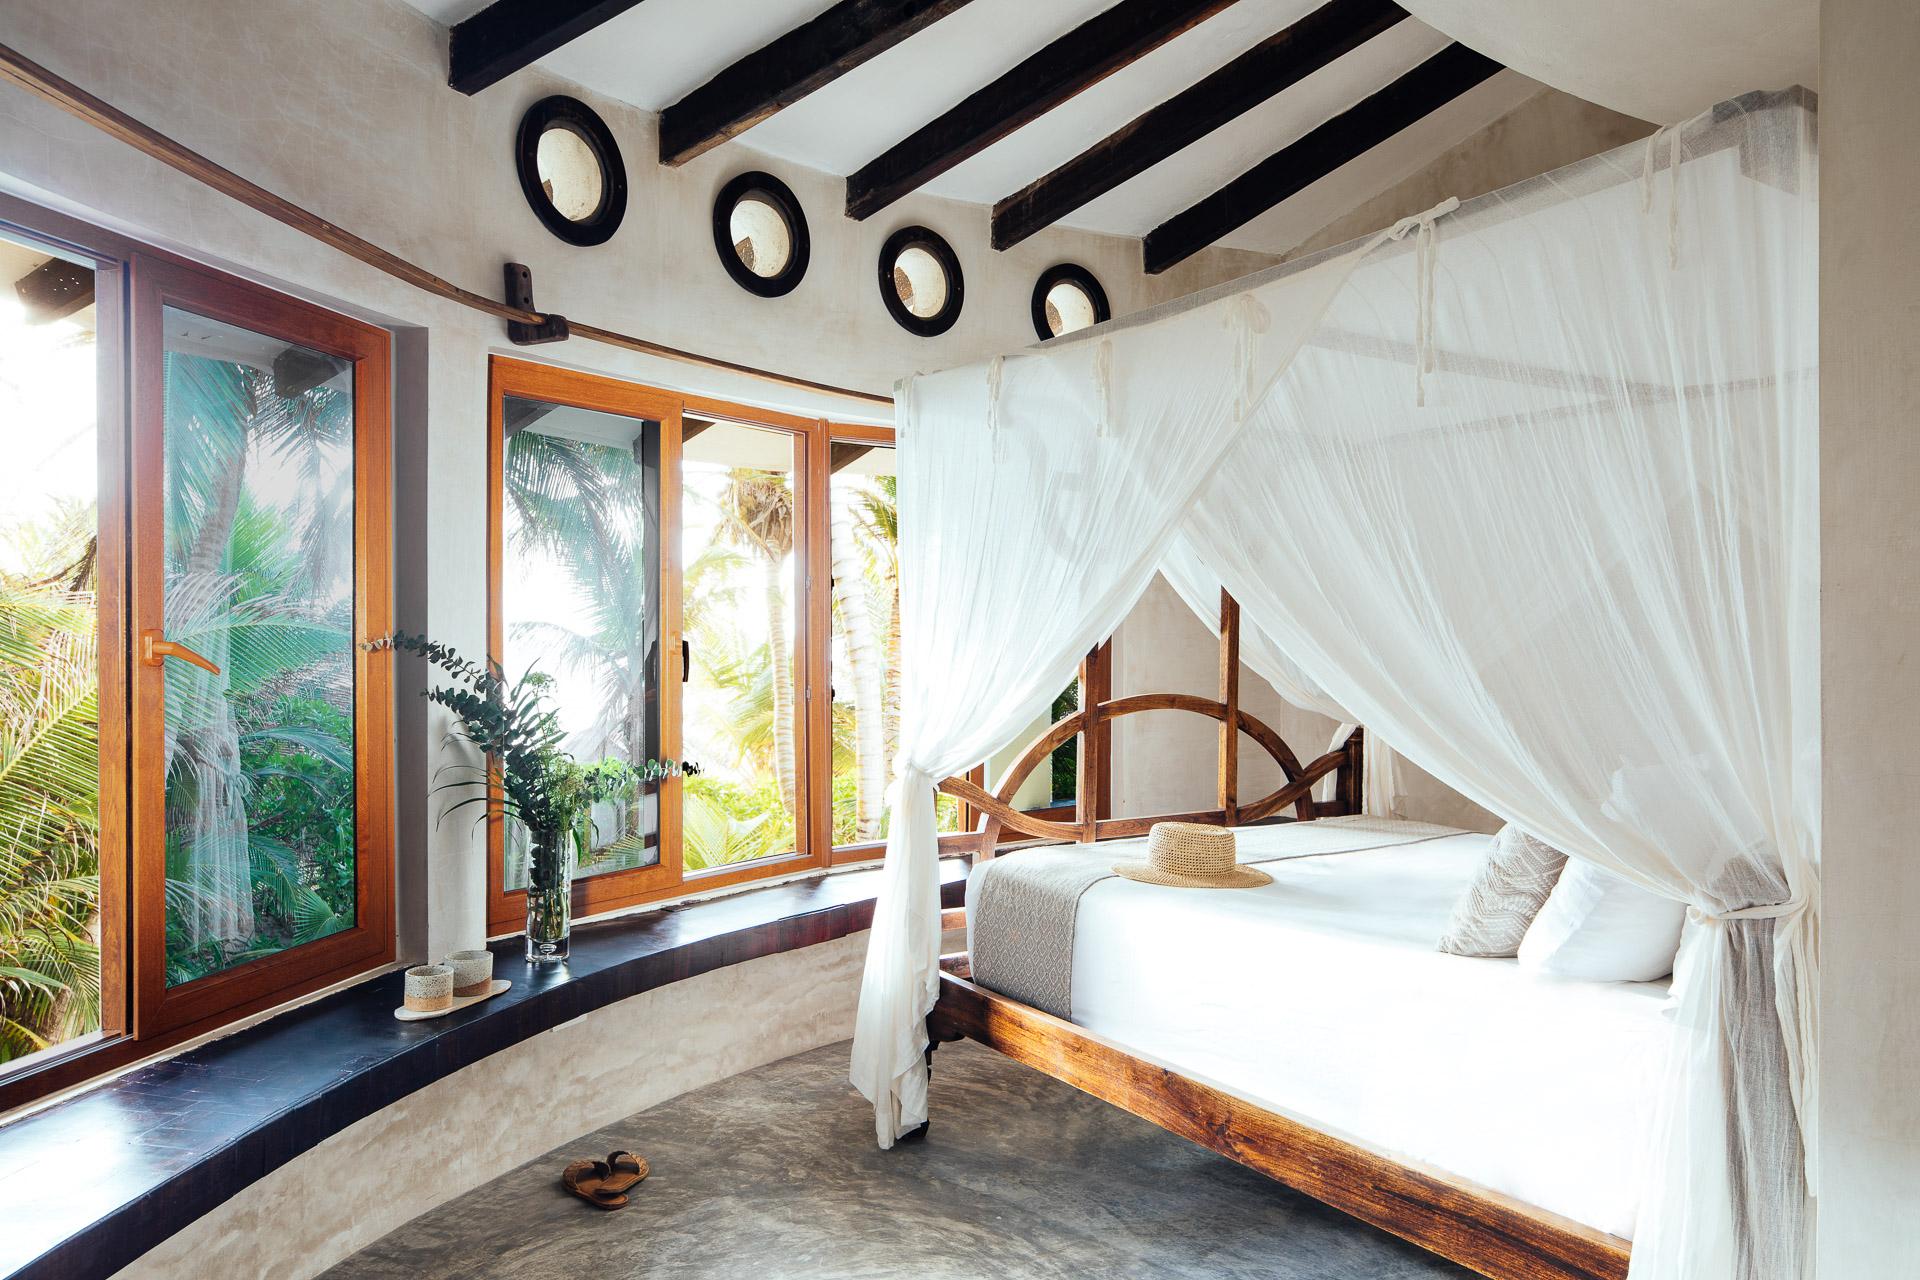 caribbean-hotel-resort-photographer-olas-tulum-mexico-.jpg